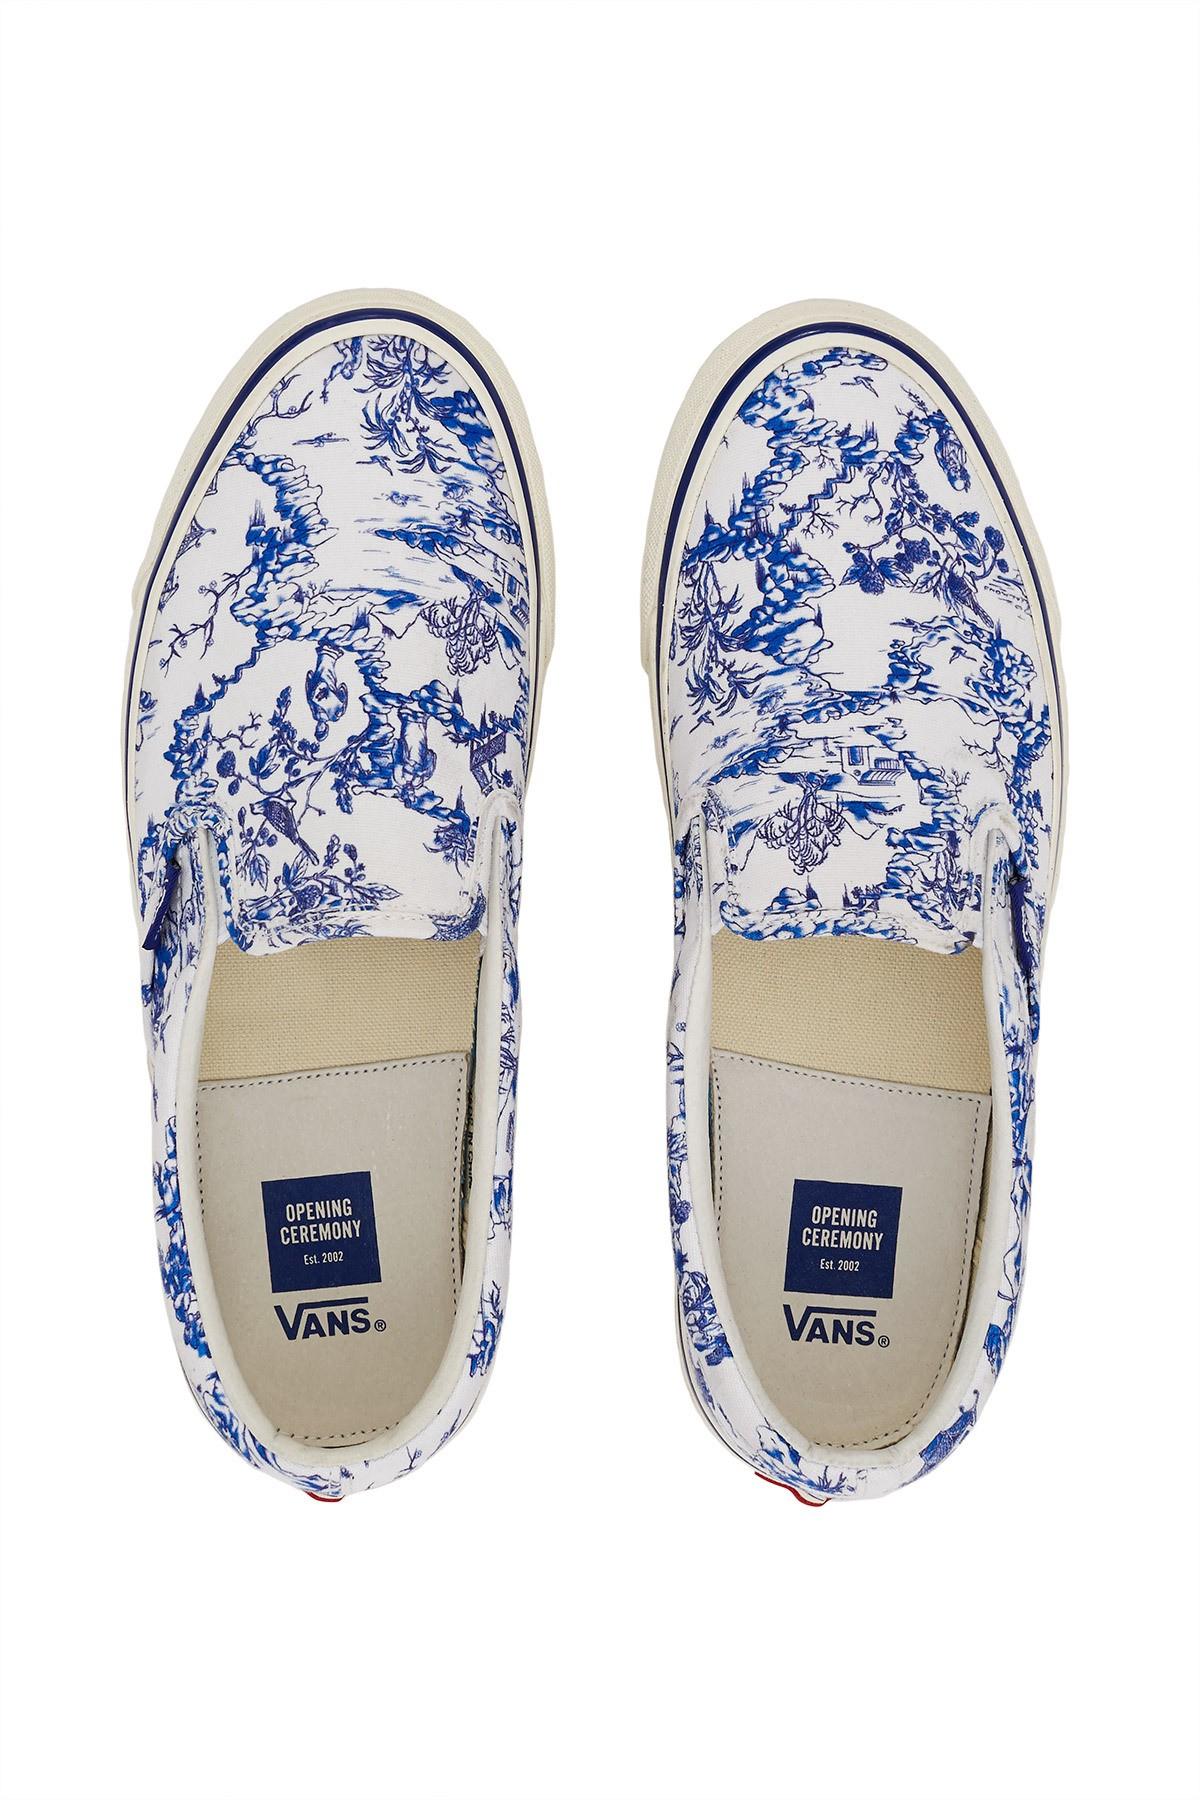 1652deb2735 Vans for Opening Ceremony. Opening Ceremony Chinoiserie Og Classic Slip-On  Lx Sneaker - M 11.5